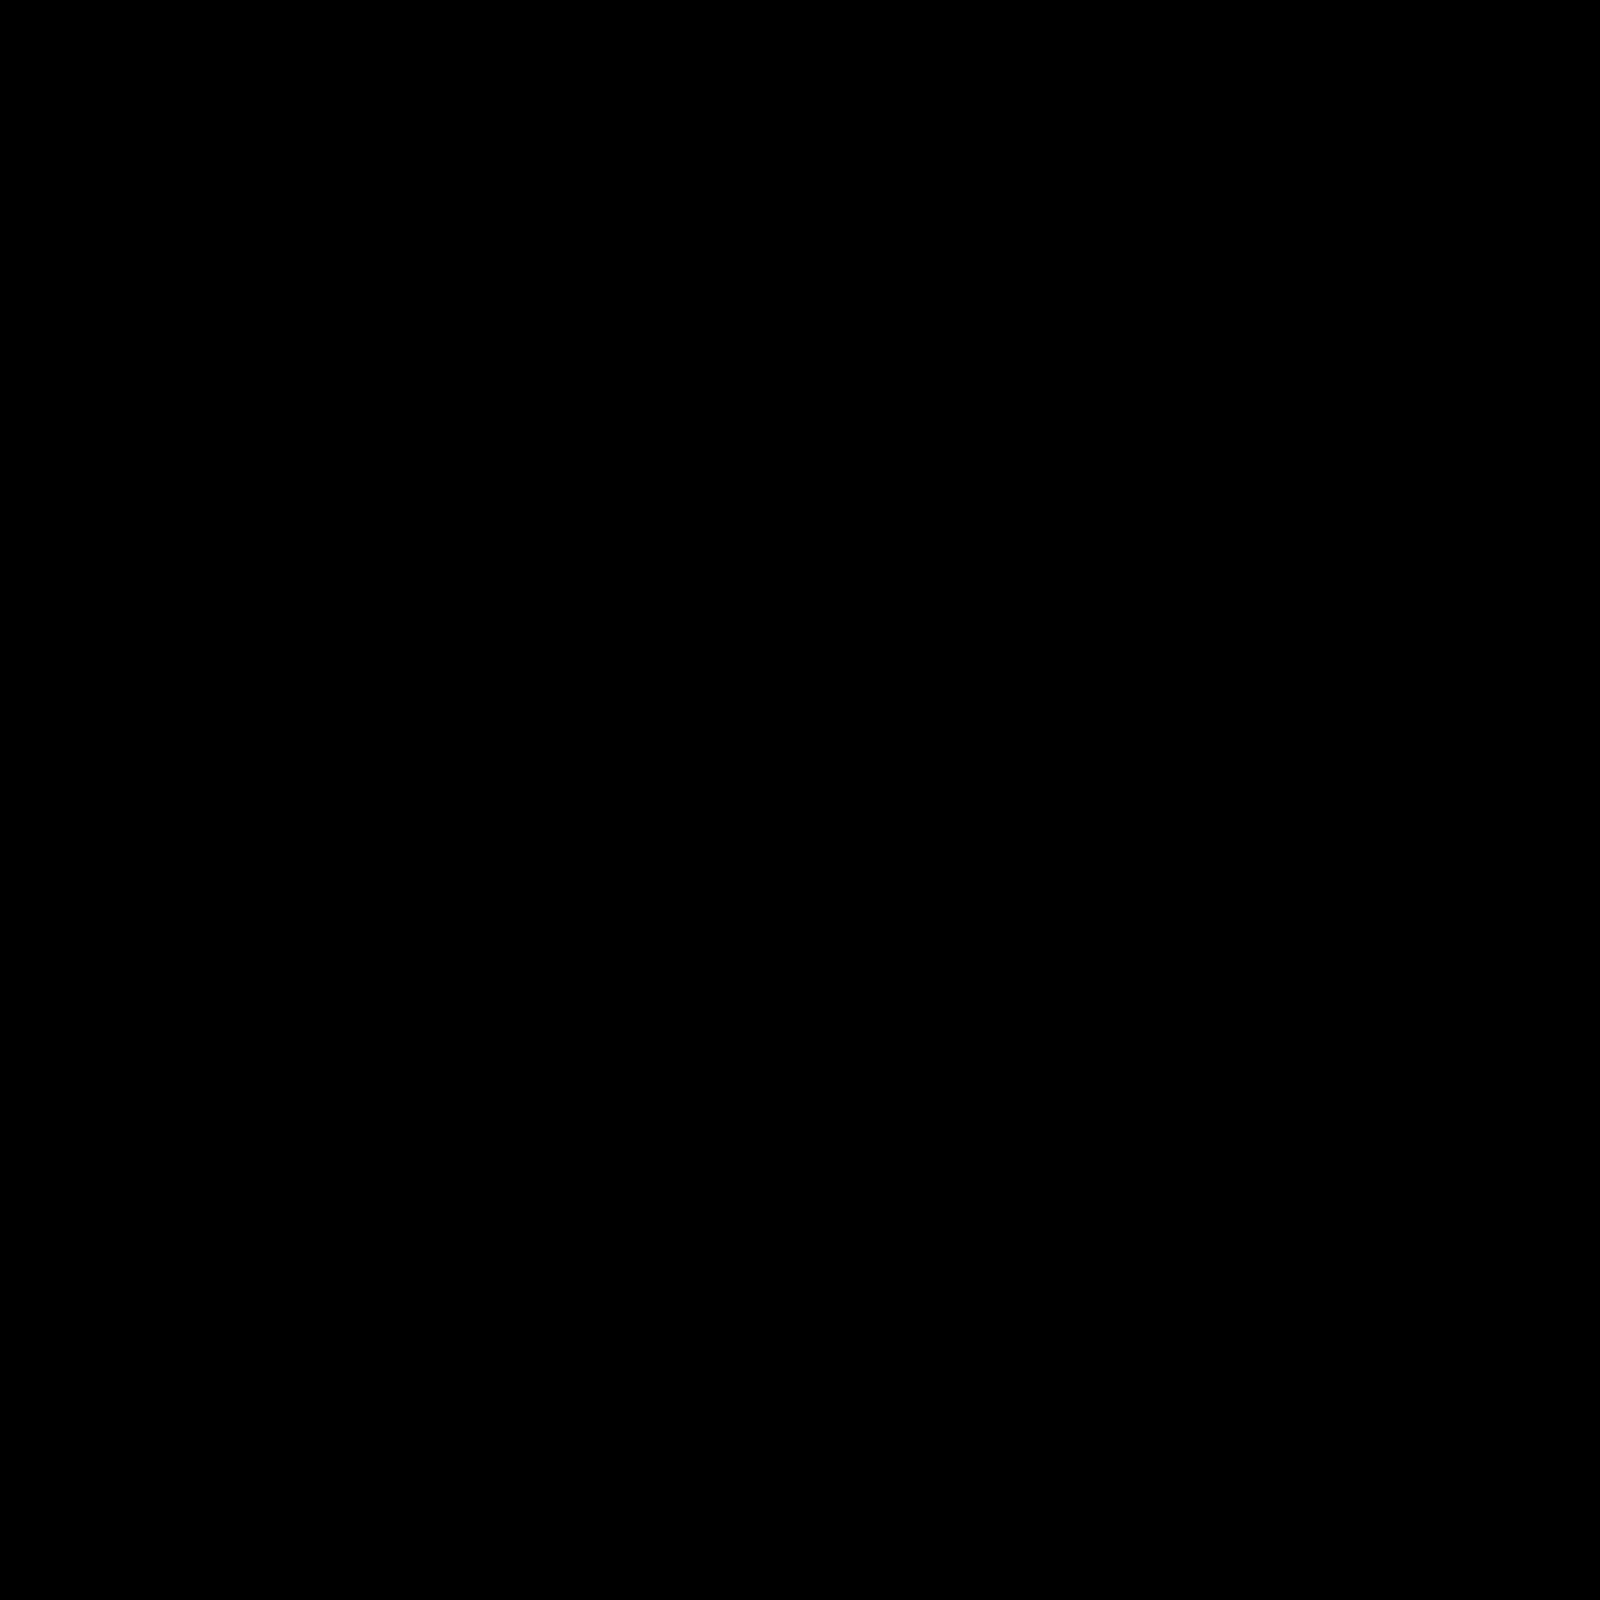 Two-Pocket Folder Filled icon